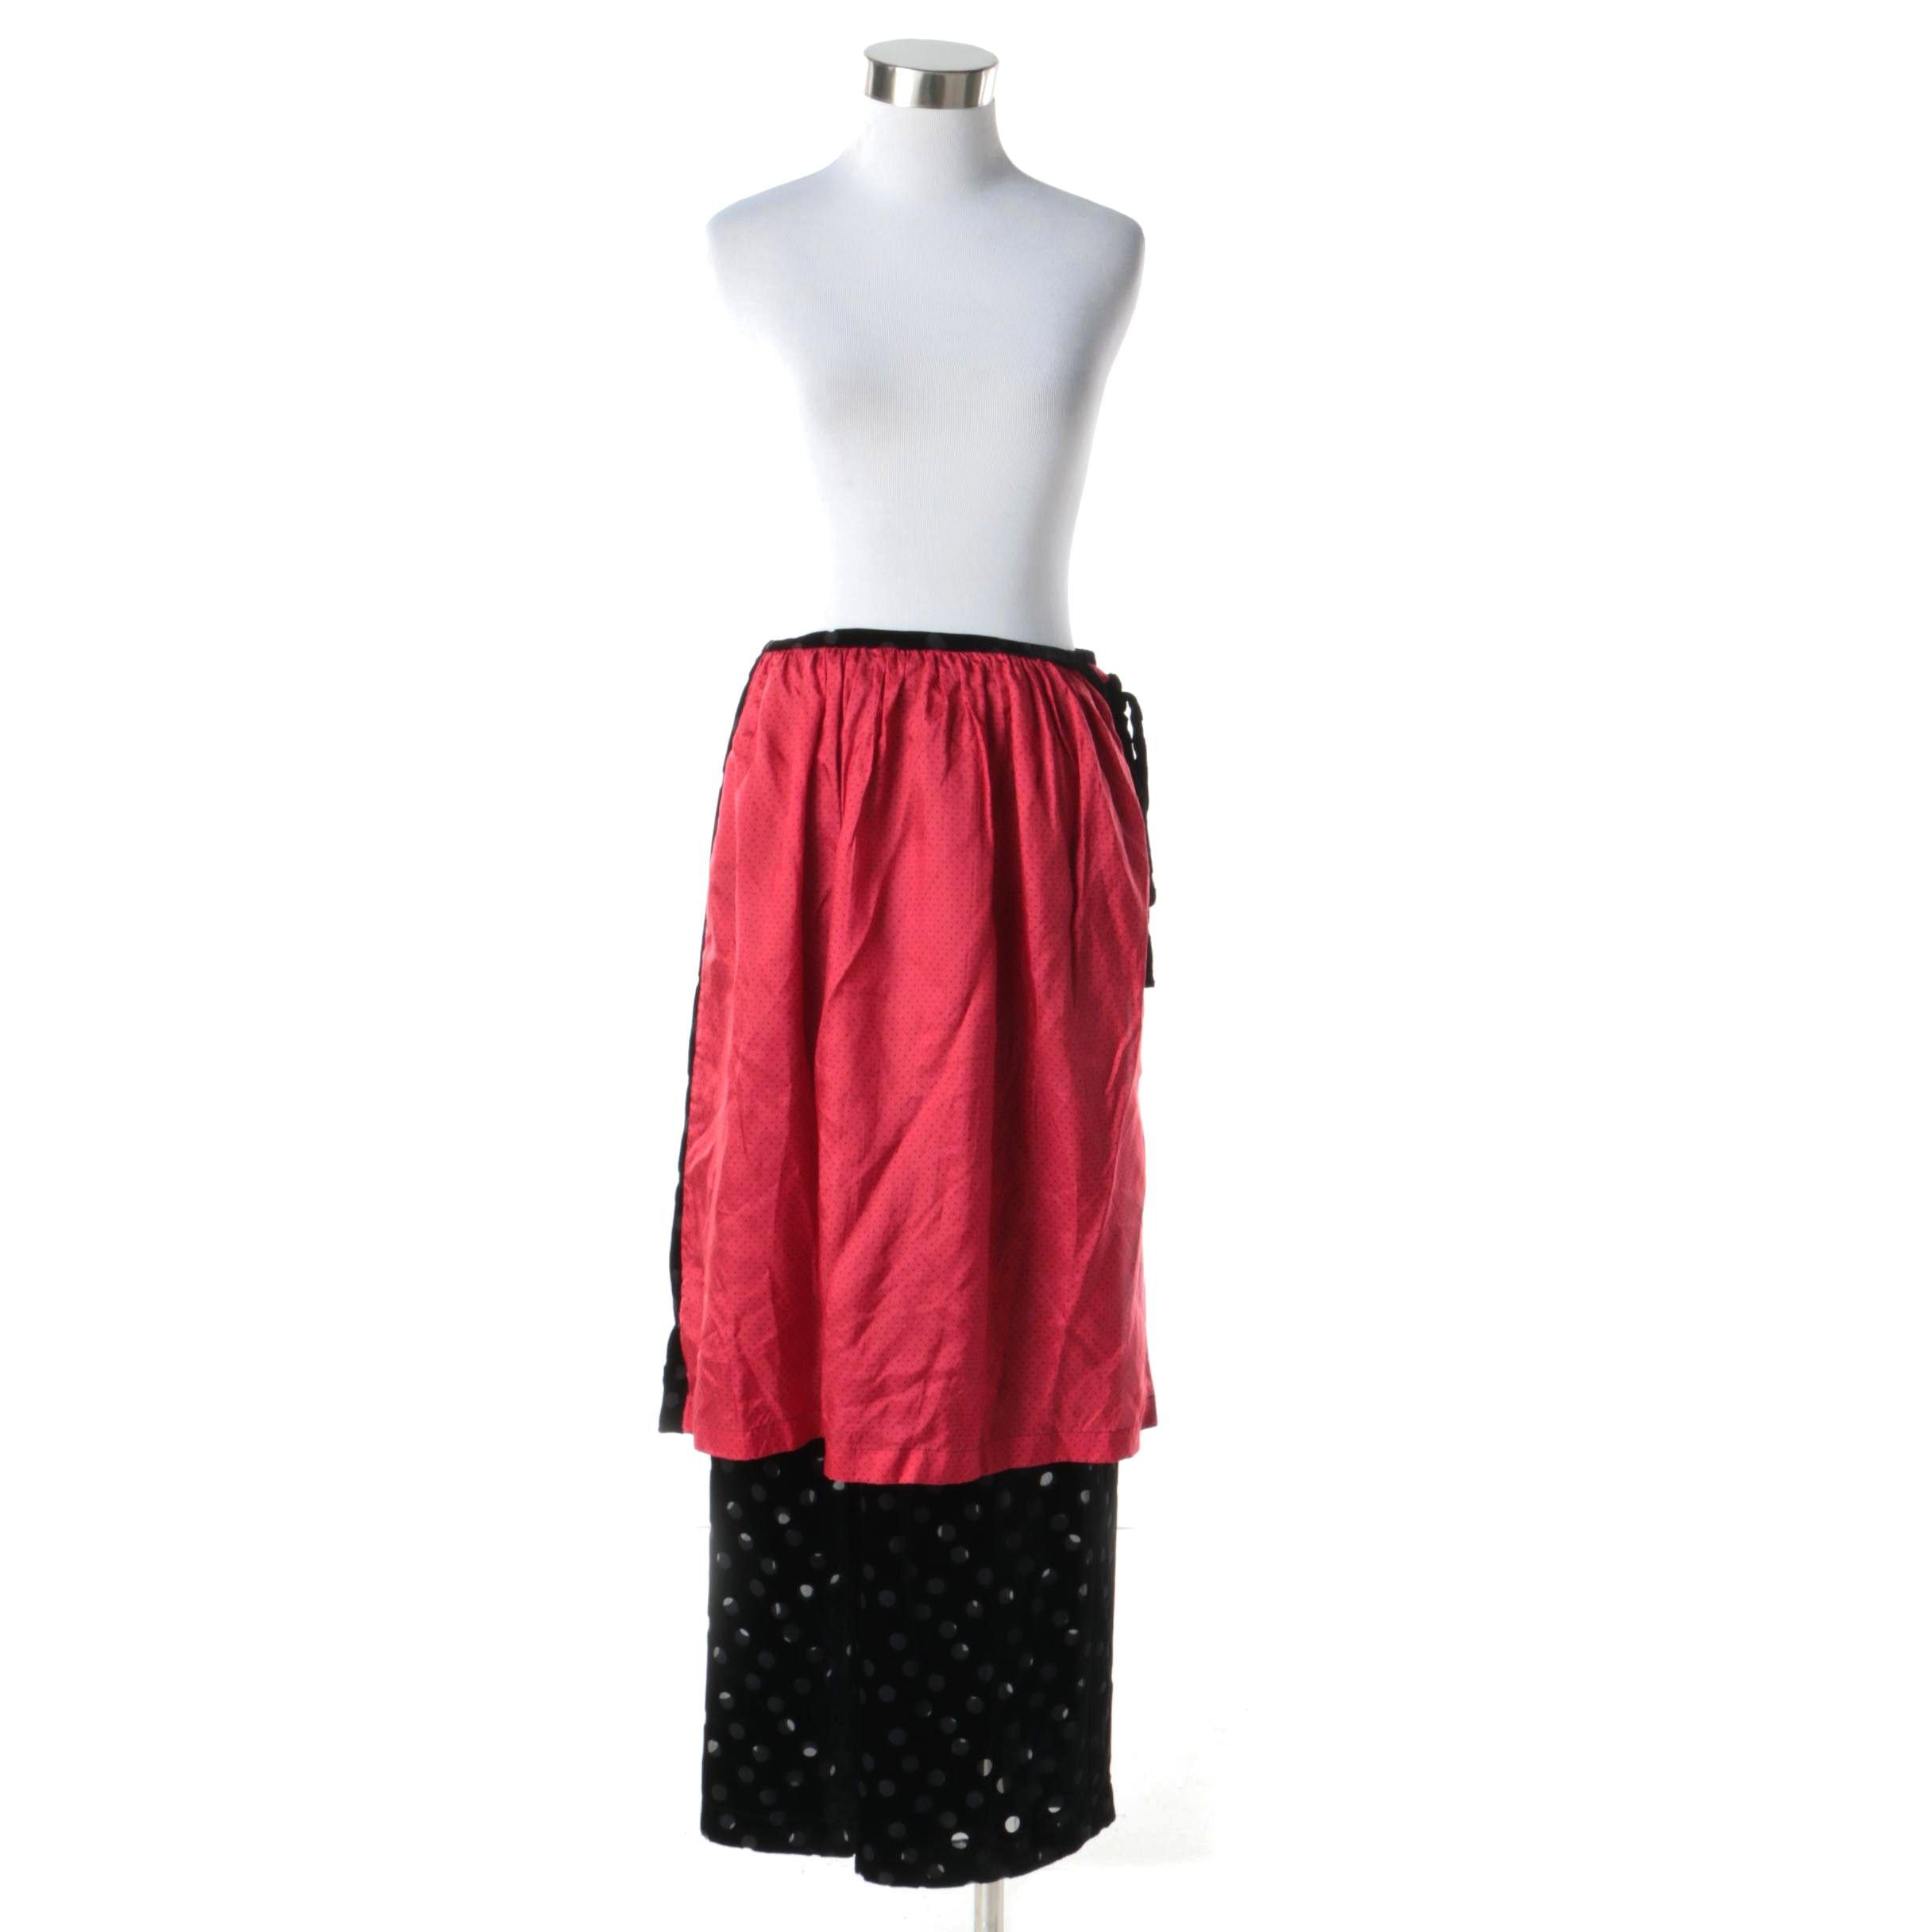 1990s Comme des Garcons Avant Garde Black Polka Dot Pants with Red Overskirt